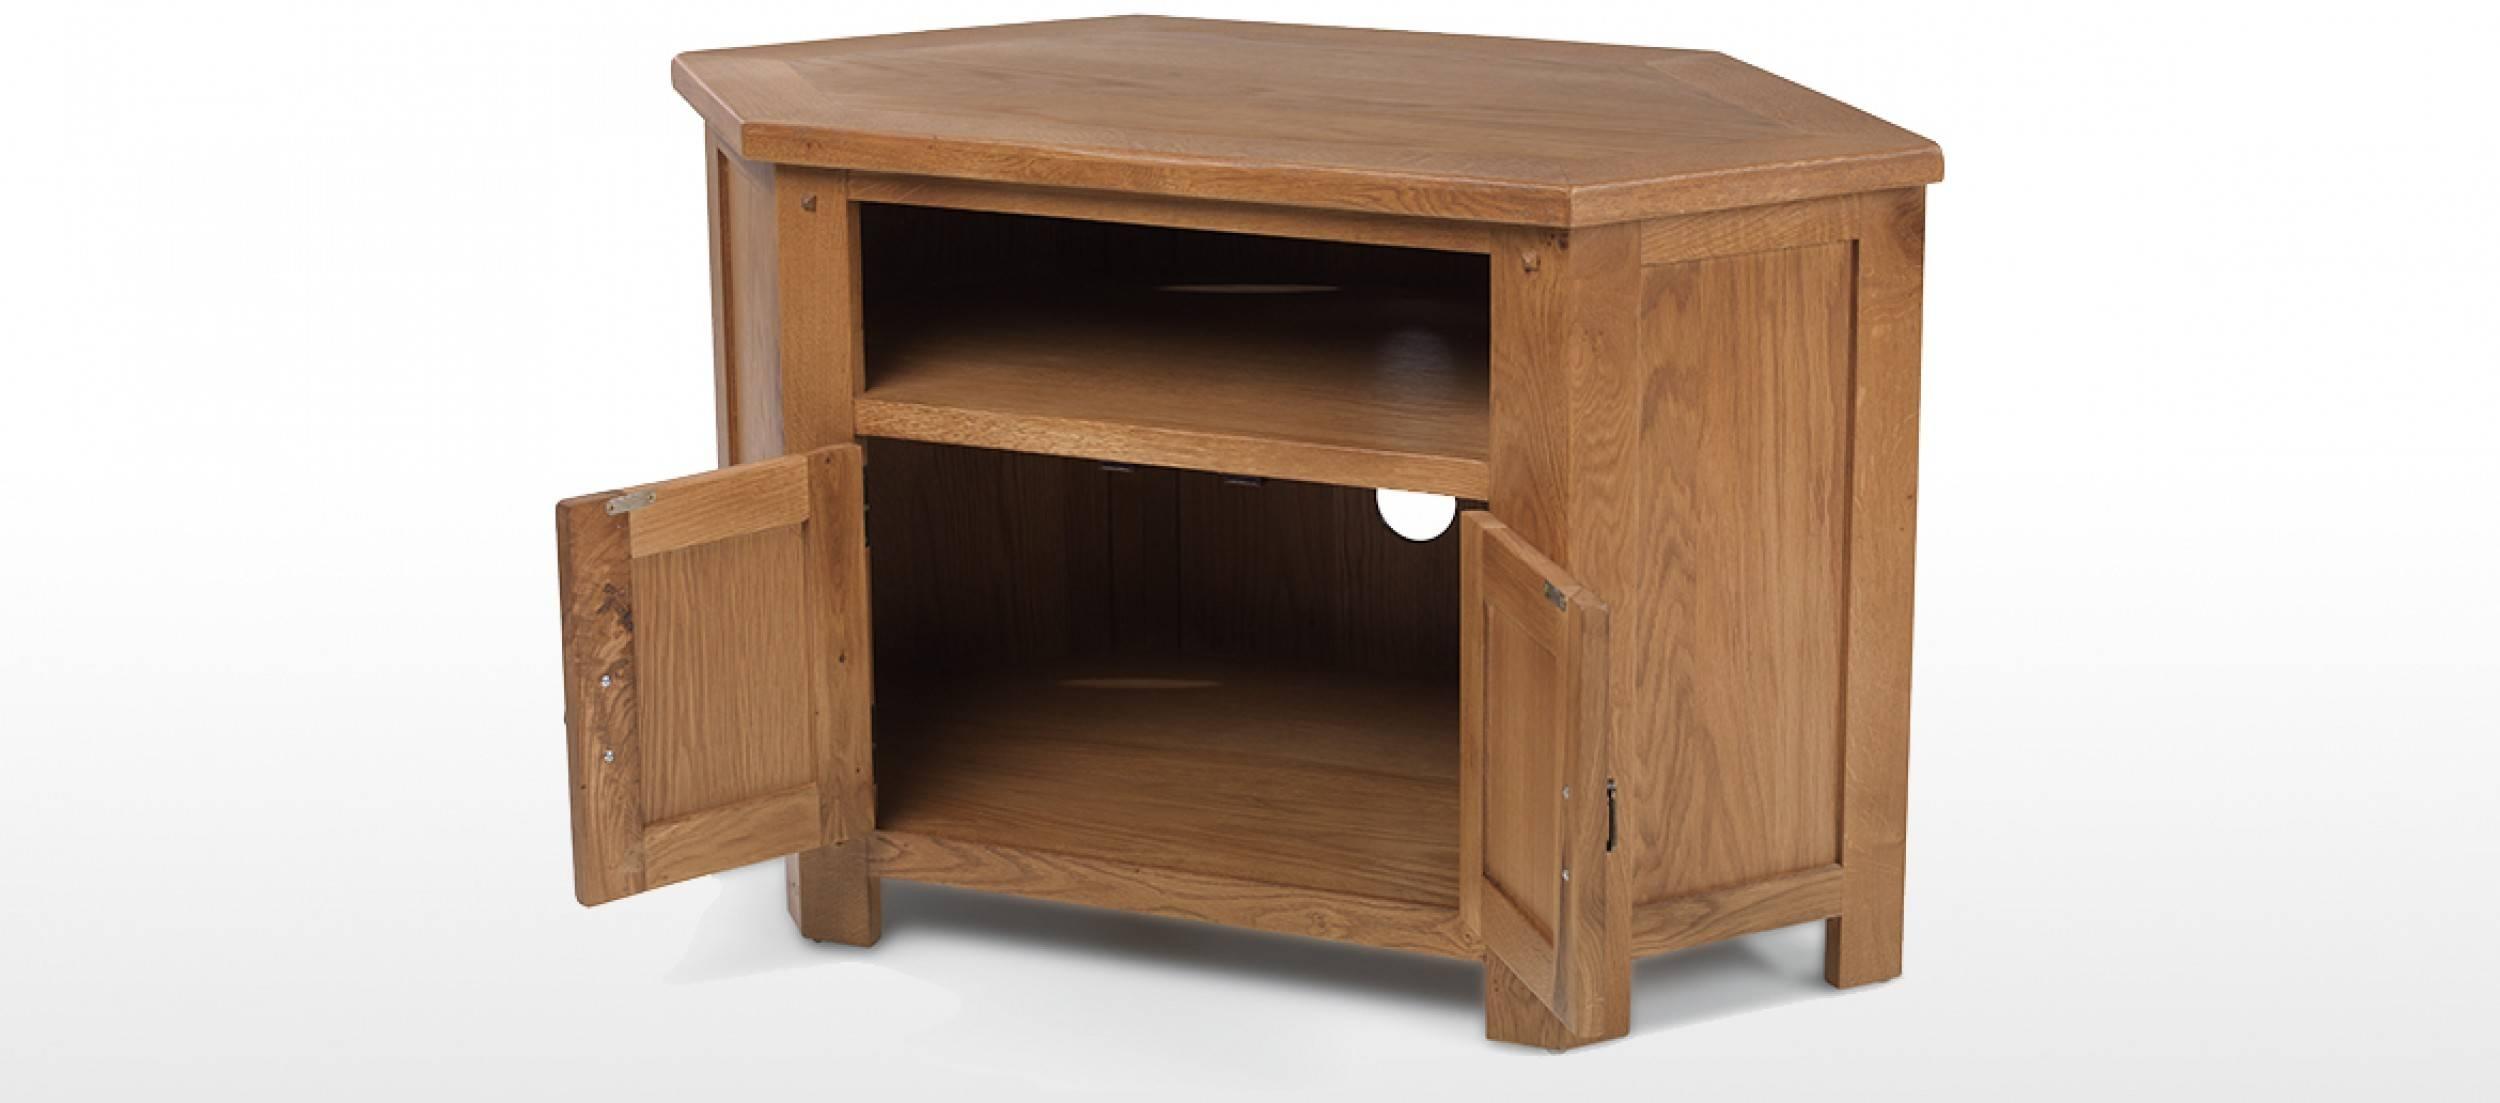 Rustic Oak Corner Tv Cabinet | Quercus Living with Rustic Corner Tv Cabinets (Image 9 of 15)